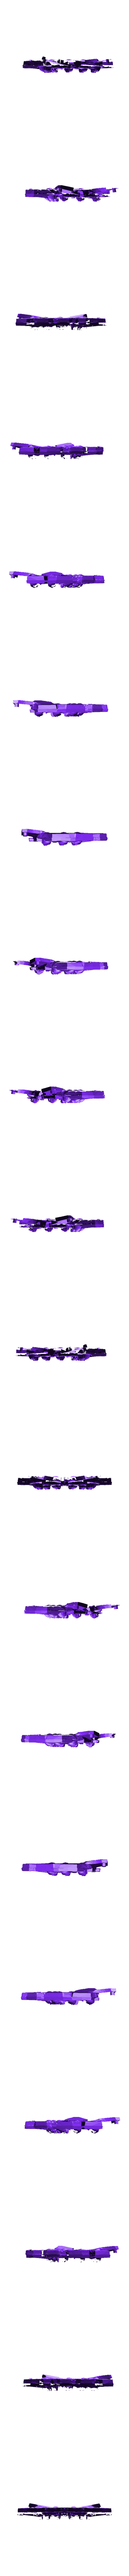 Aztec_Armiger_groin.stl Download free STL file Aztec Armor Bearer  - Conversion Kit • Model to 3D print, ErikTheHeretek